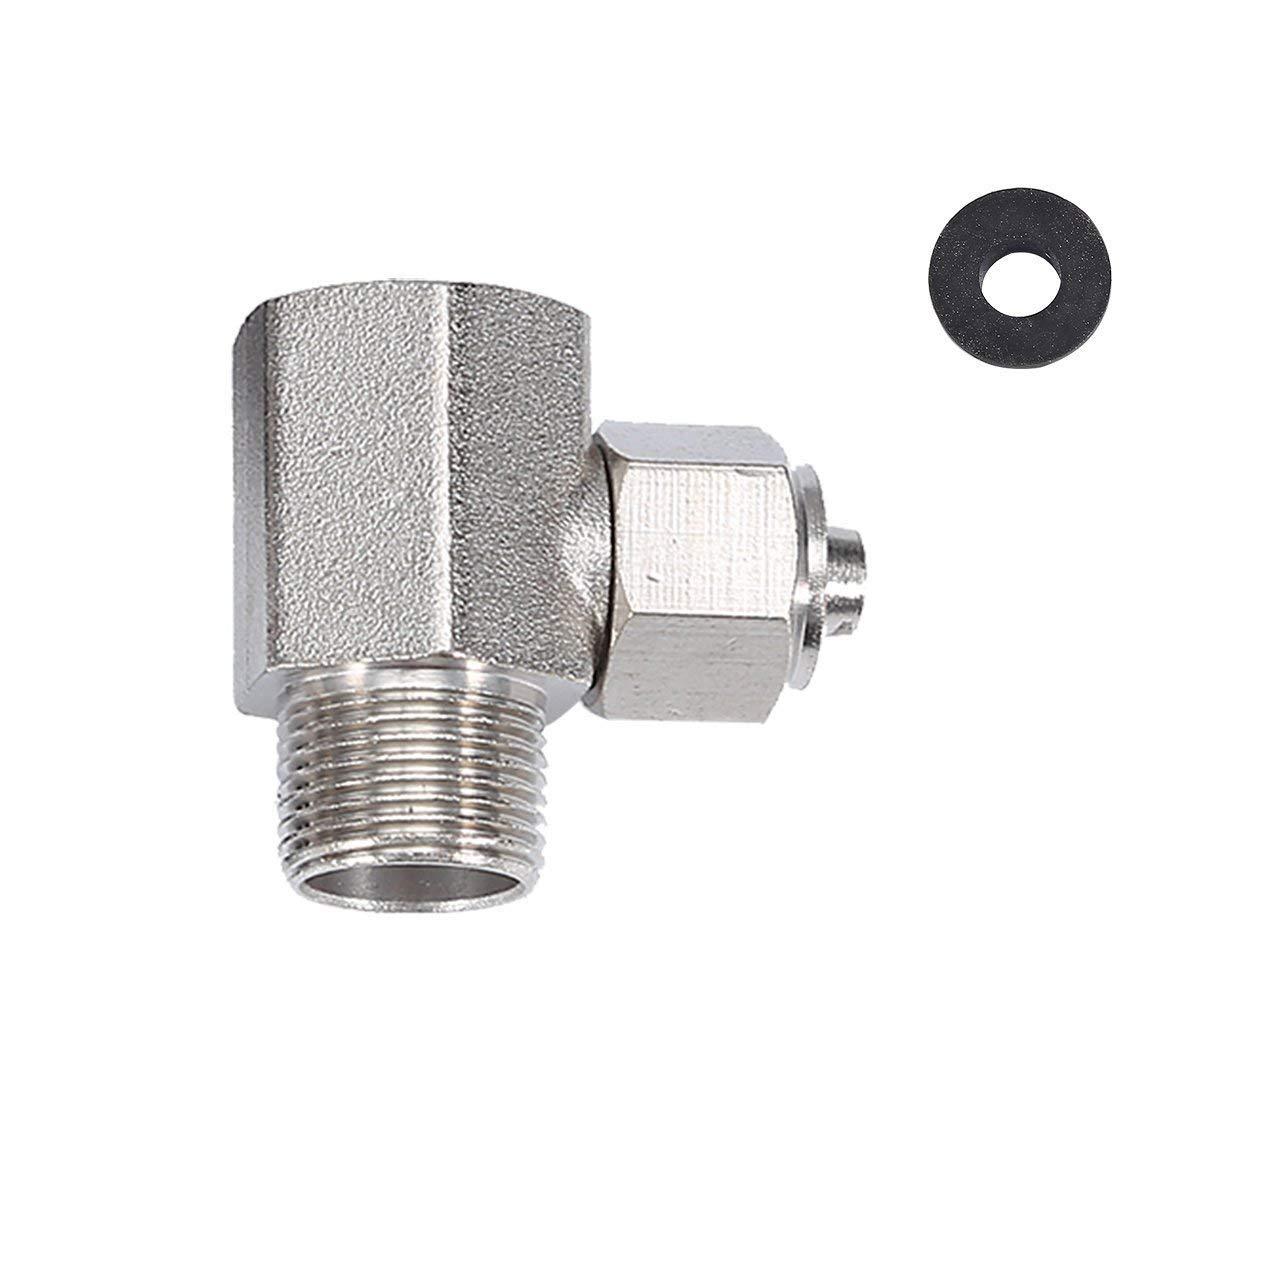 Amazetec 9/16 Replacement Copper T Adapter for Bidet Amazetec-048 / Amazetec-00048